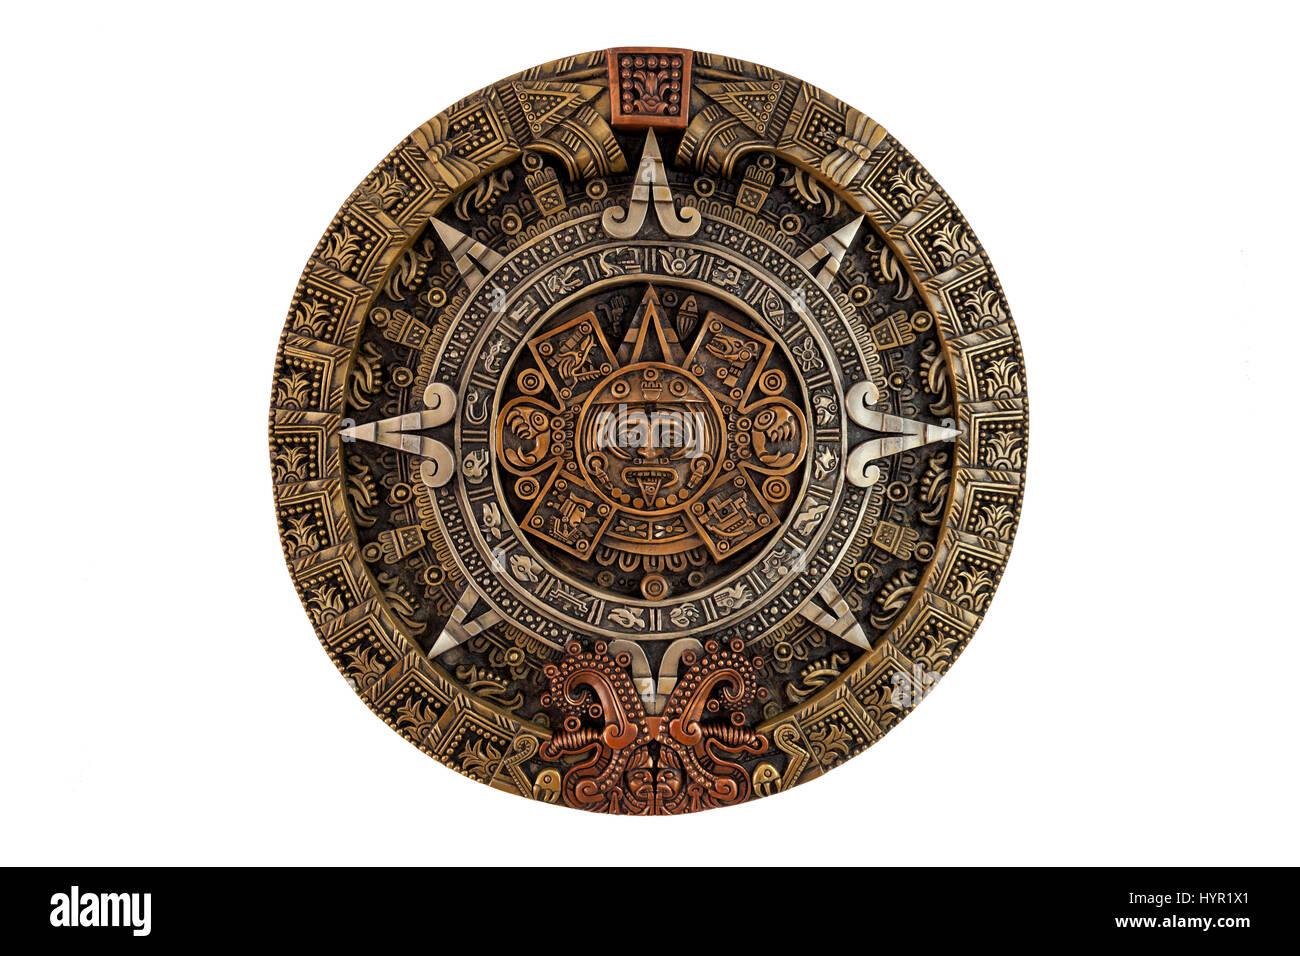 Calendario Antico.Isolato Antico Calendario Azteco Foto Immagine Stock